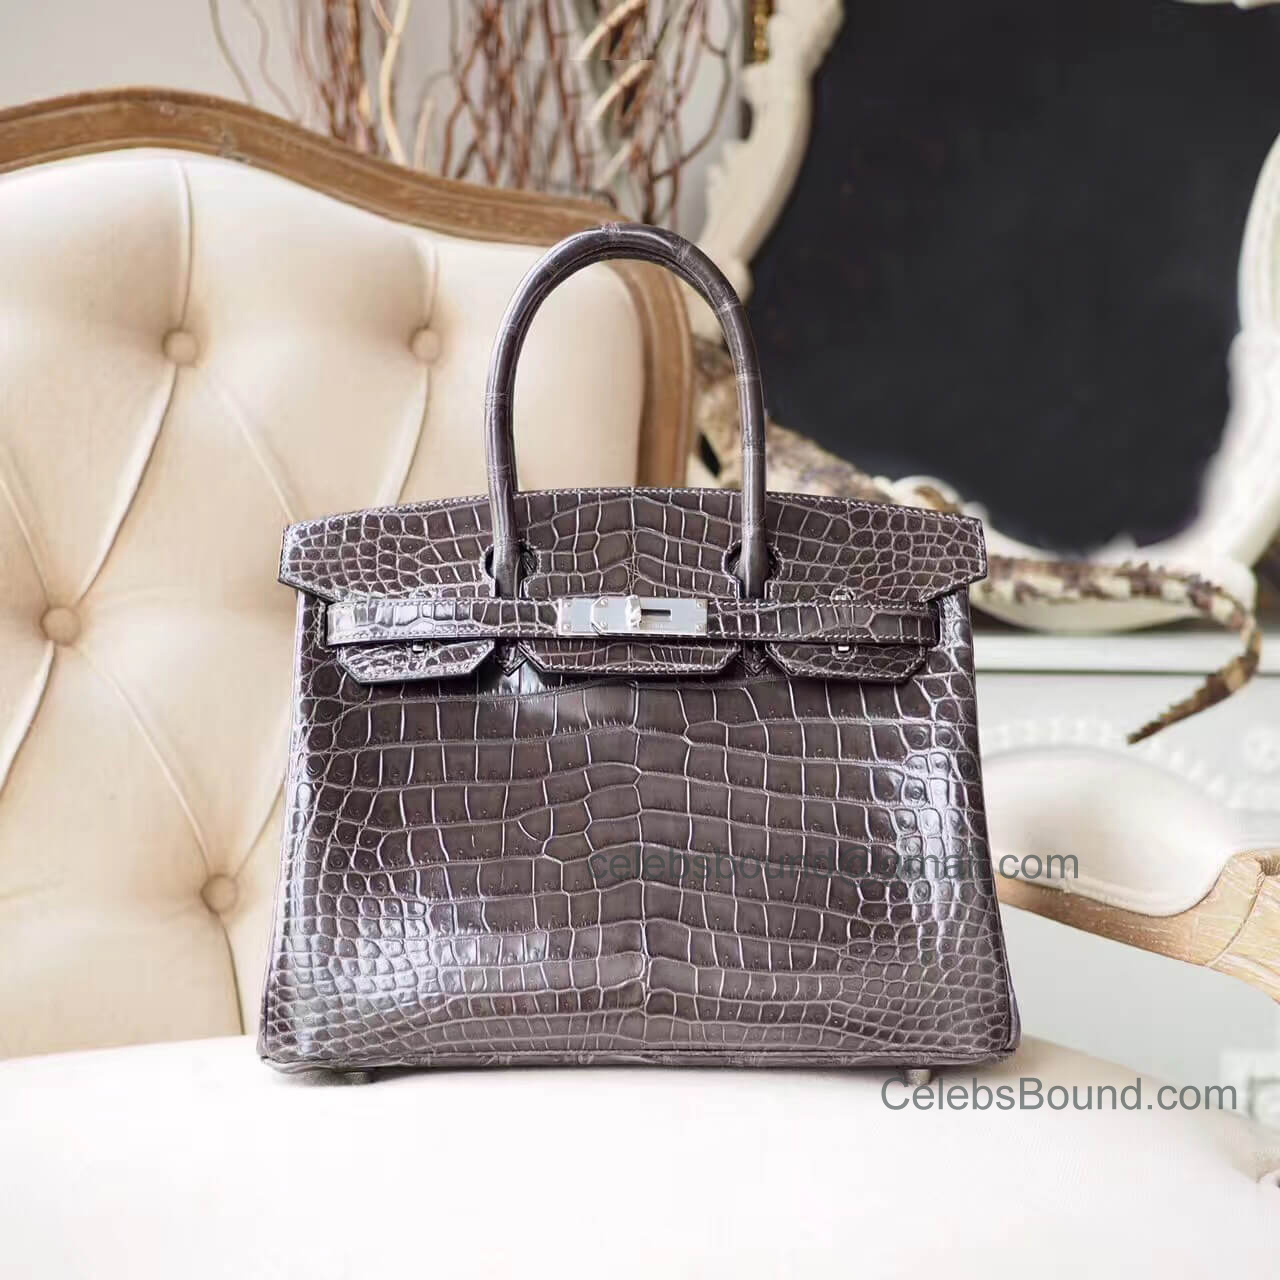 13caca0f2664 Copy Hermes Birkin 30 Bag in ck88 Graphite Shiny Porosus Croc PHW -